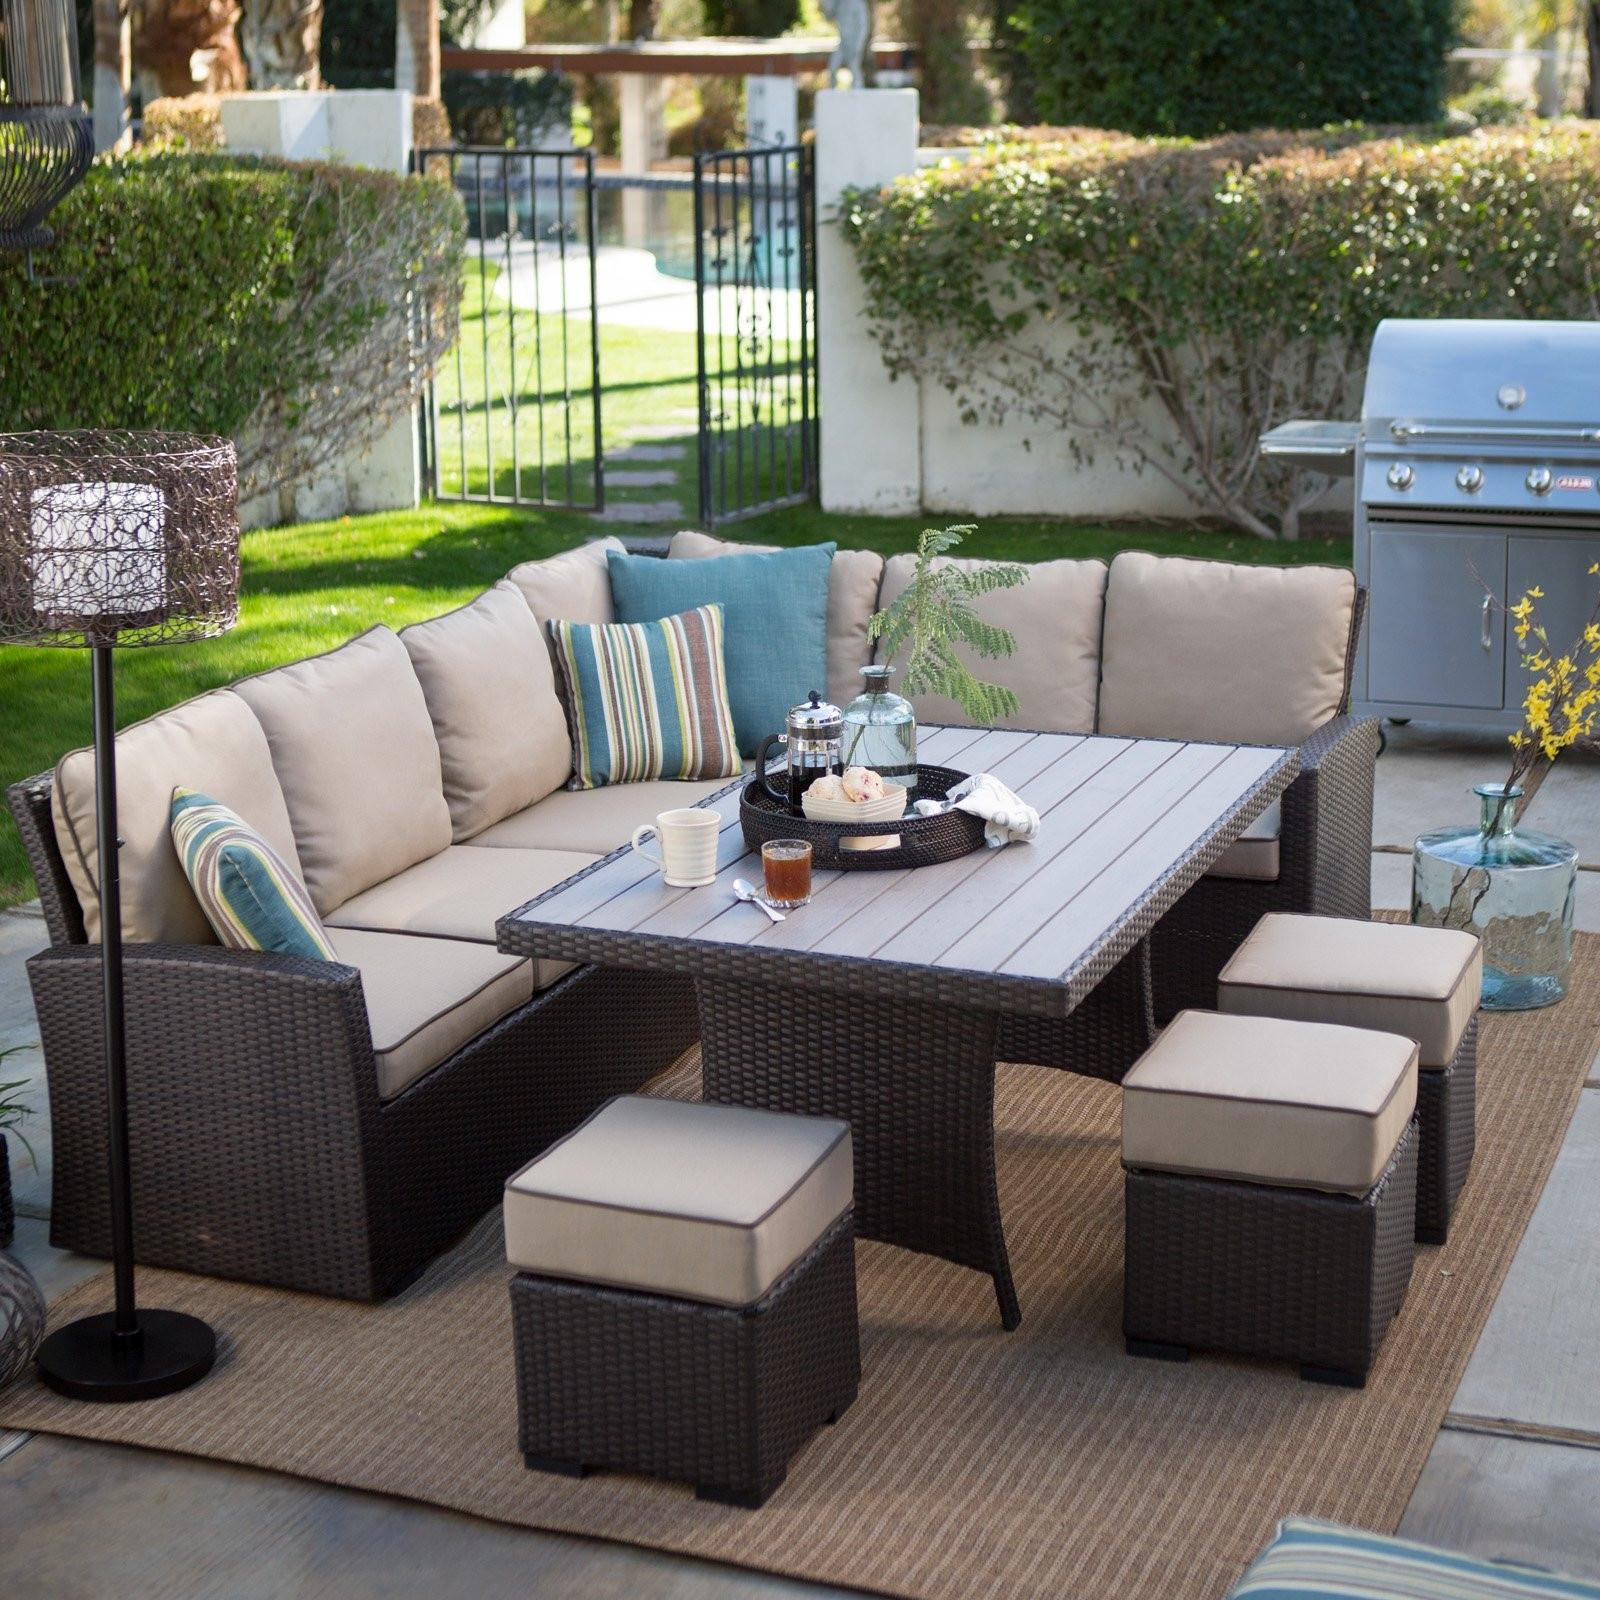 Best And Newest Wayfair Outdoor Patio Conversation Sets Intended For Wayfair Outdoor Conversation Sets Wayfair Outdoor Furniture (View 1 of 15)